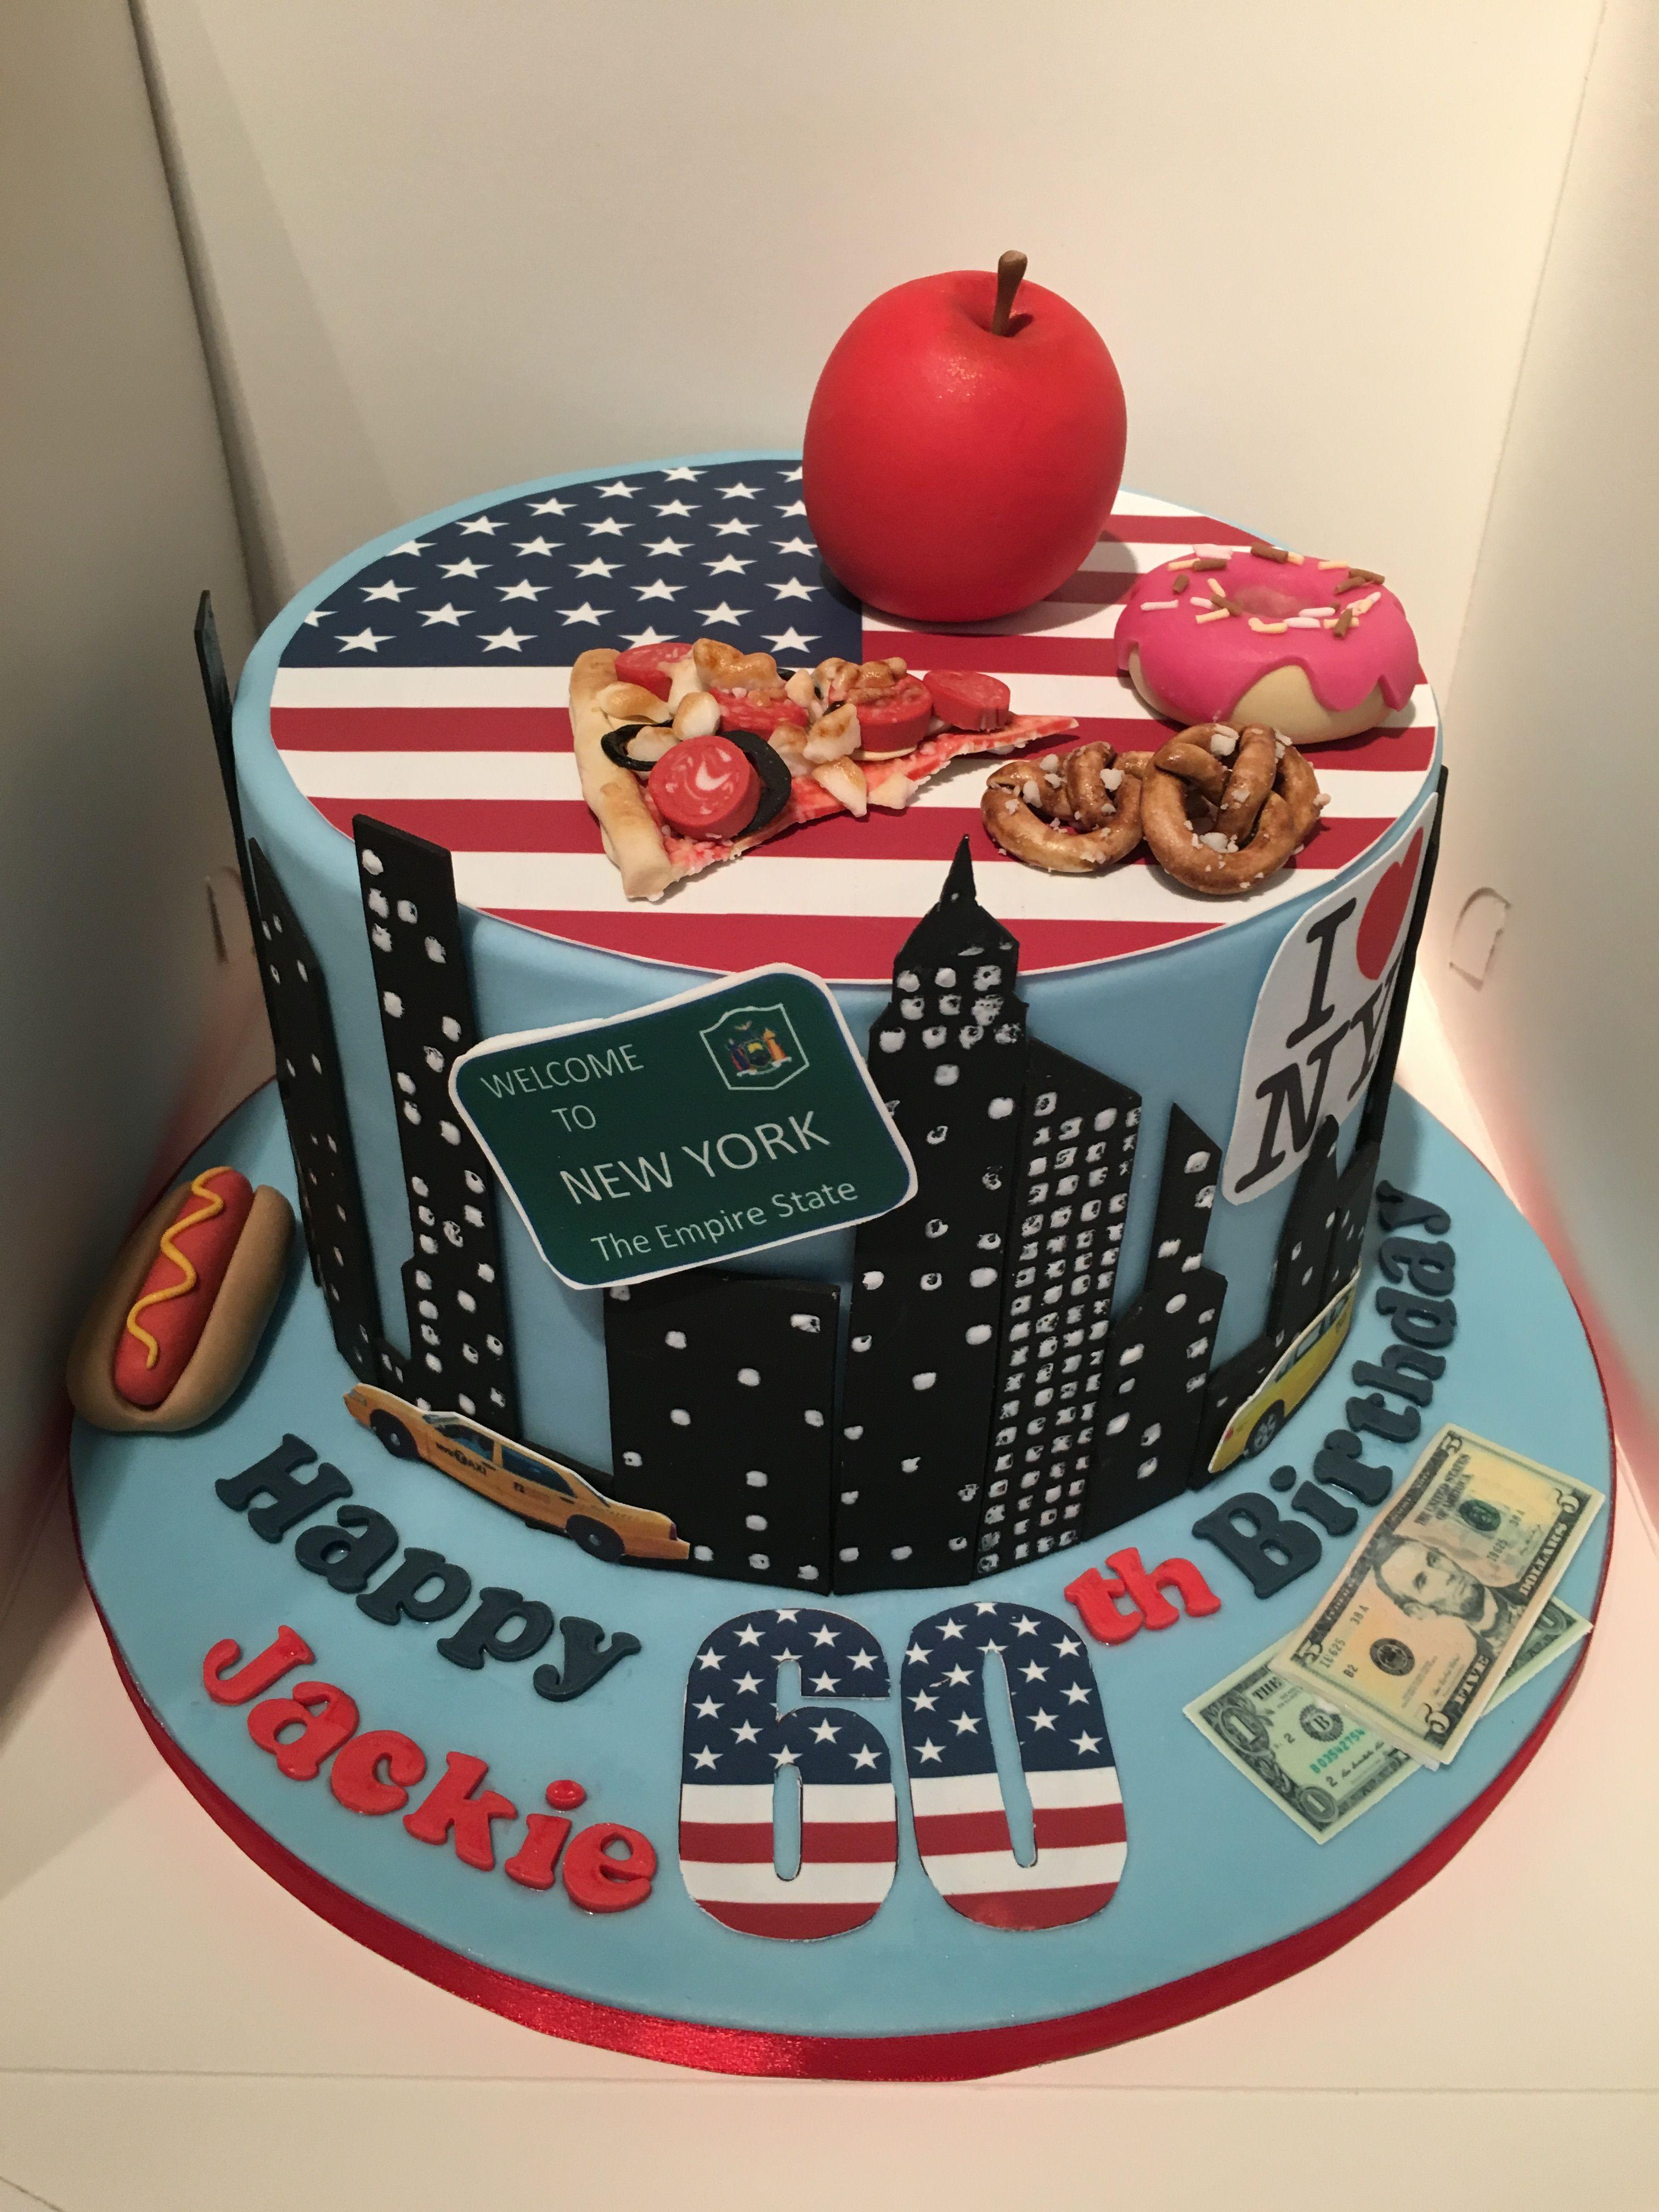 Outstanding New York Themed Birthday Cake New York Cake Themed Birthday Cakes Funny Birthday Cards Online Elaedamsfinfo